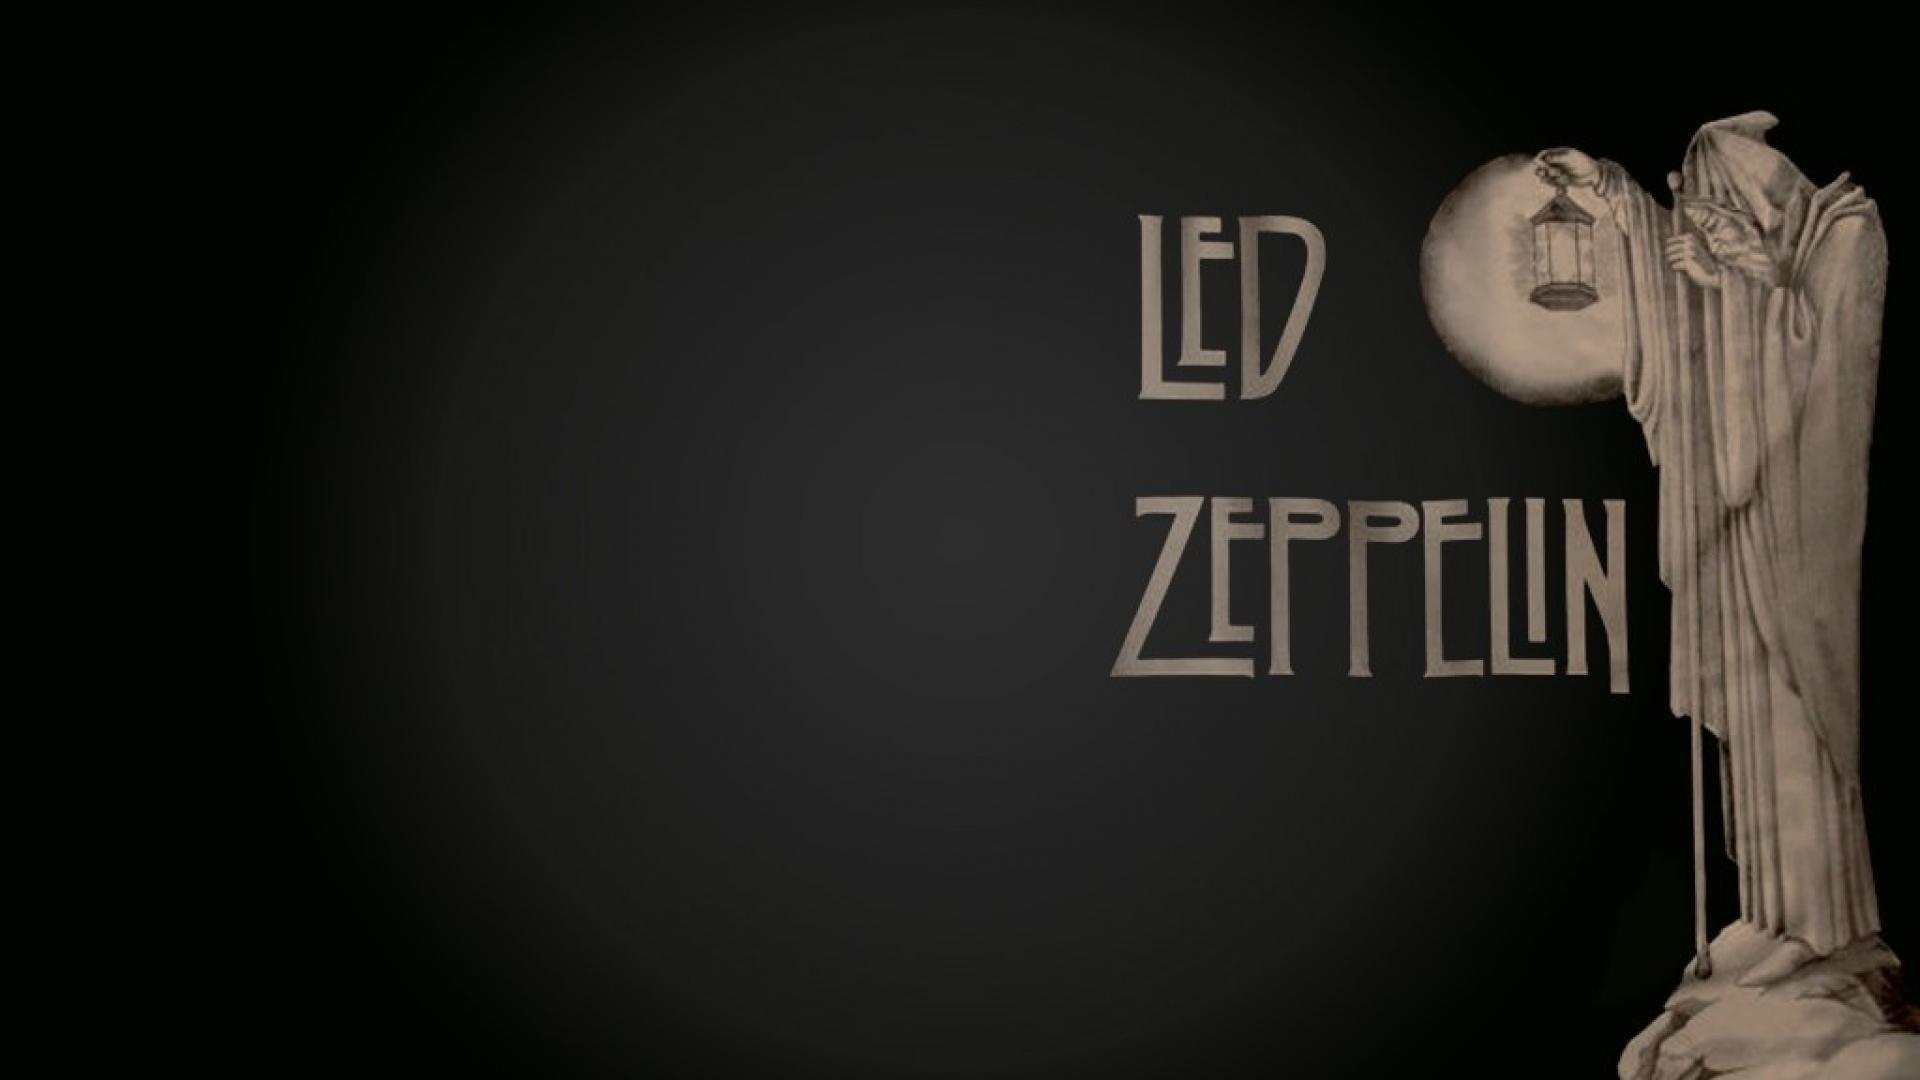 Led Zeppelin Background 63 Images